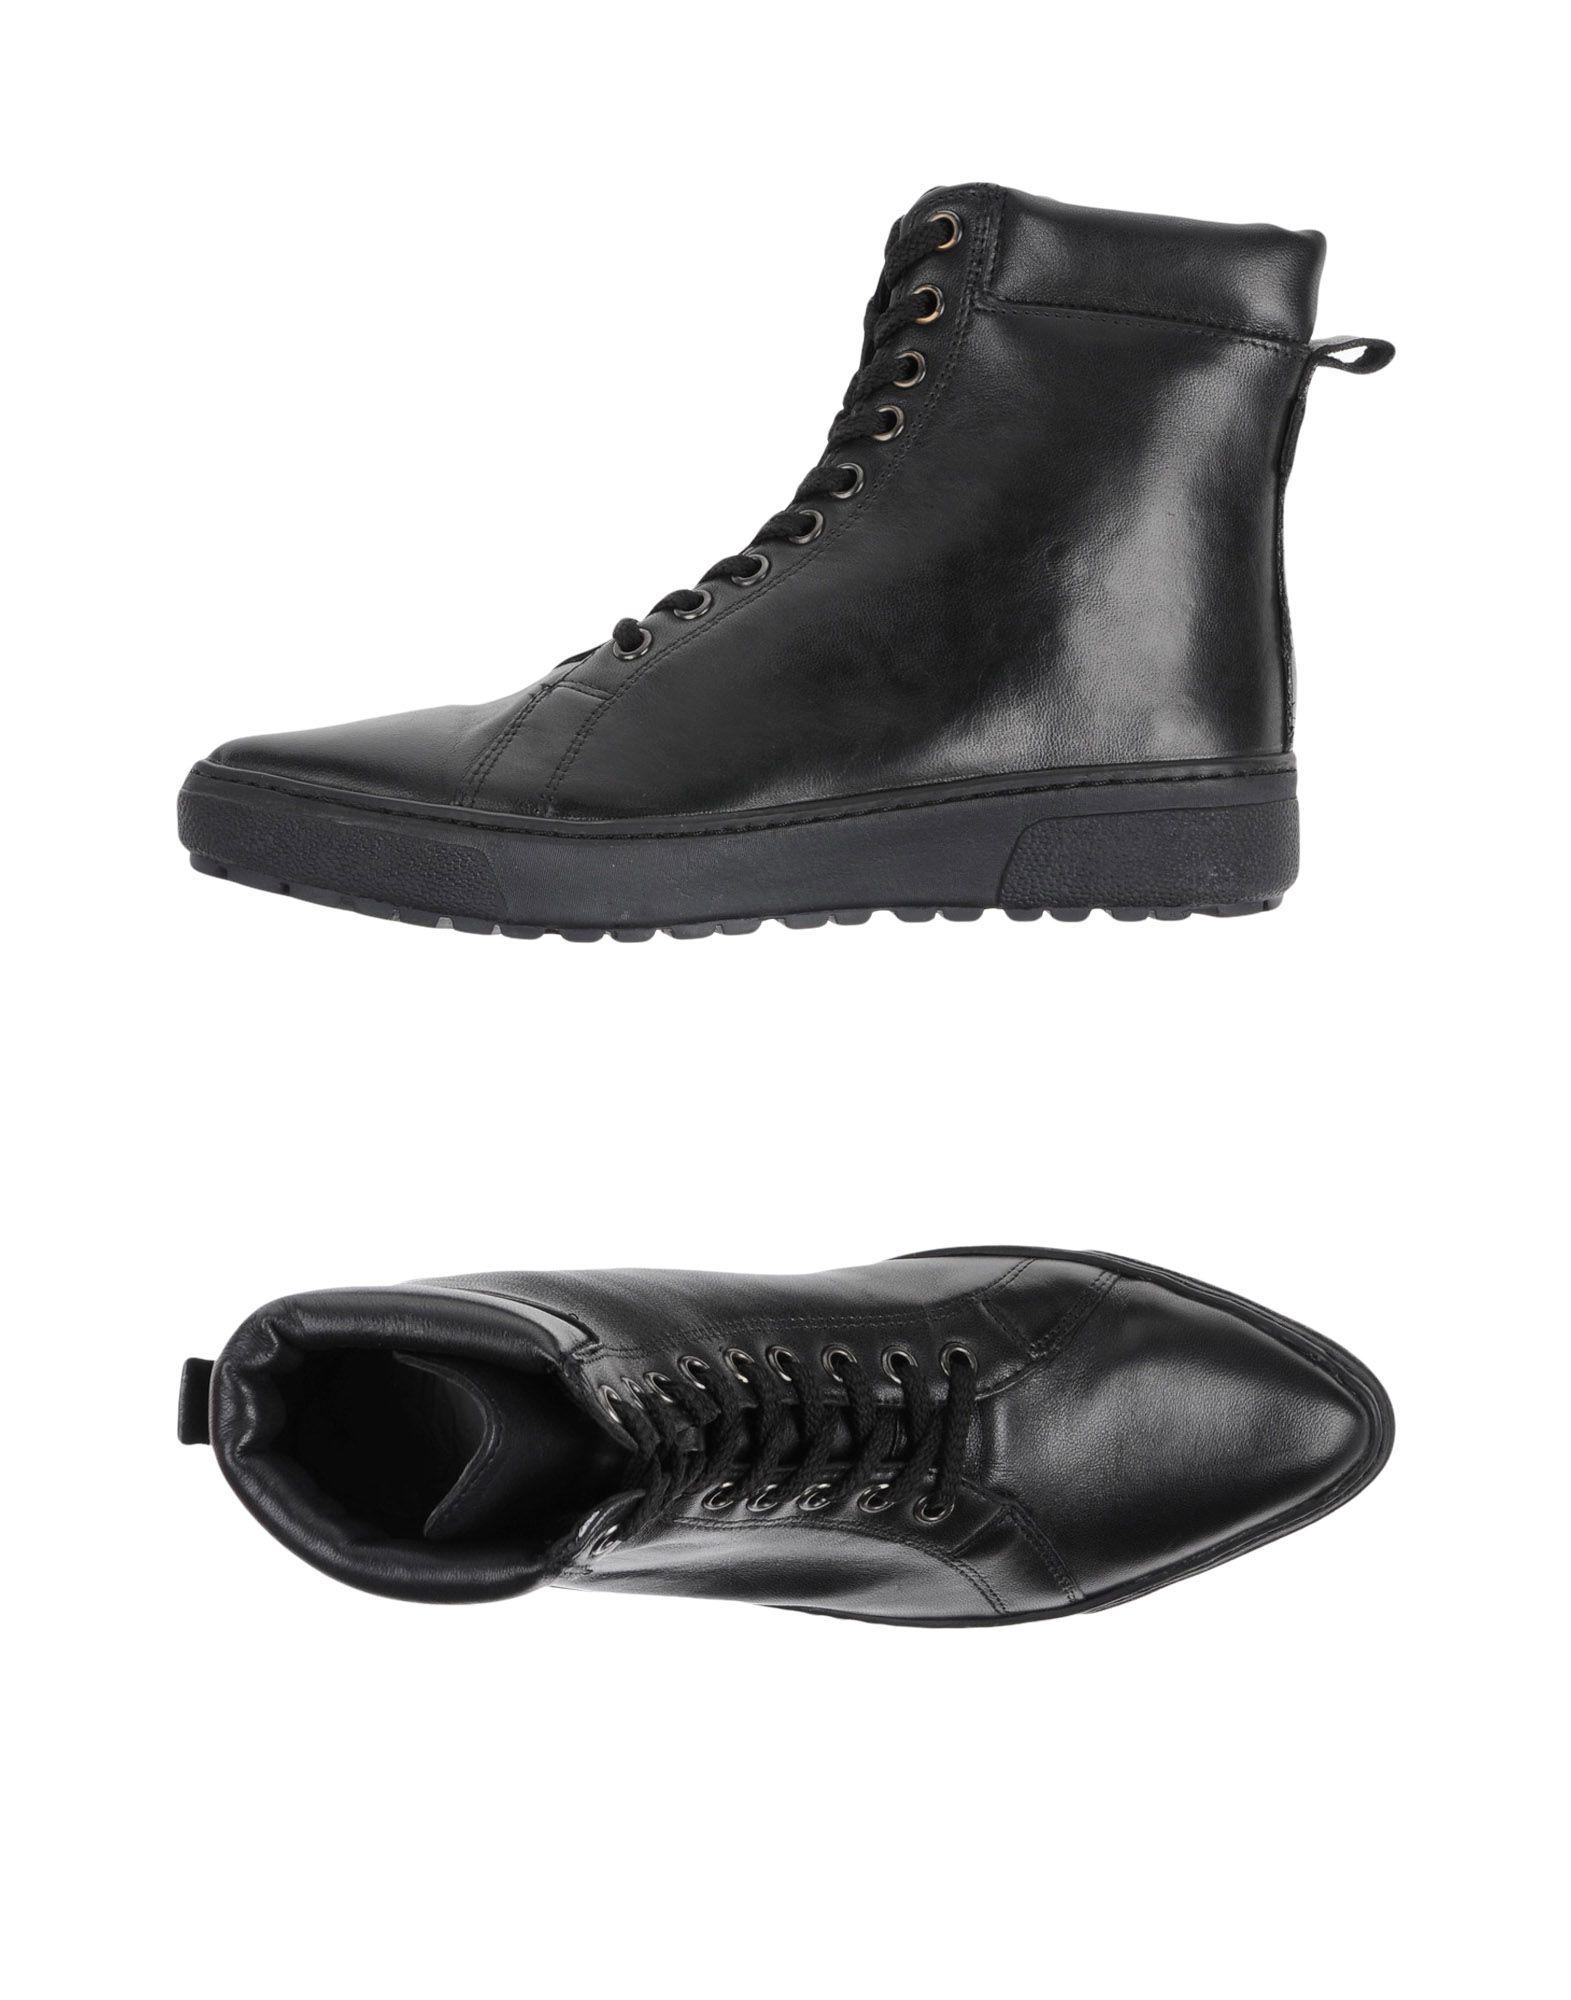 TALEJA Высокие кеды и кроссовки кеды кроссовки высокие dc council mid tx stone camo